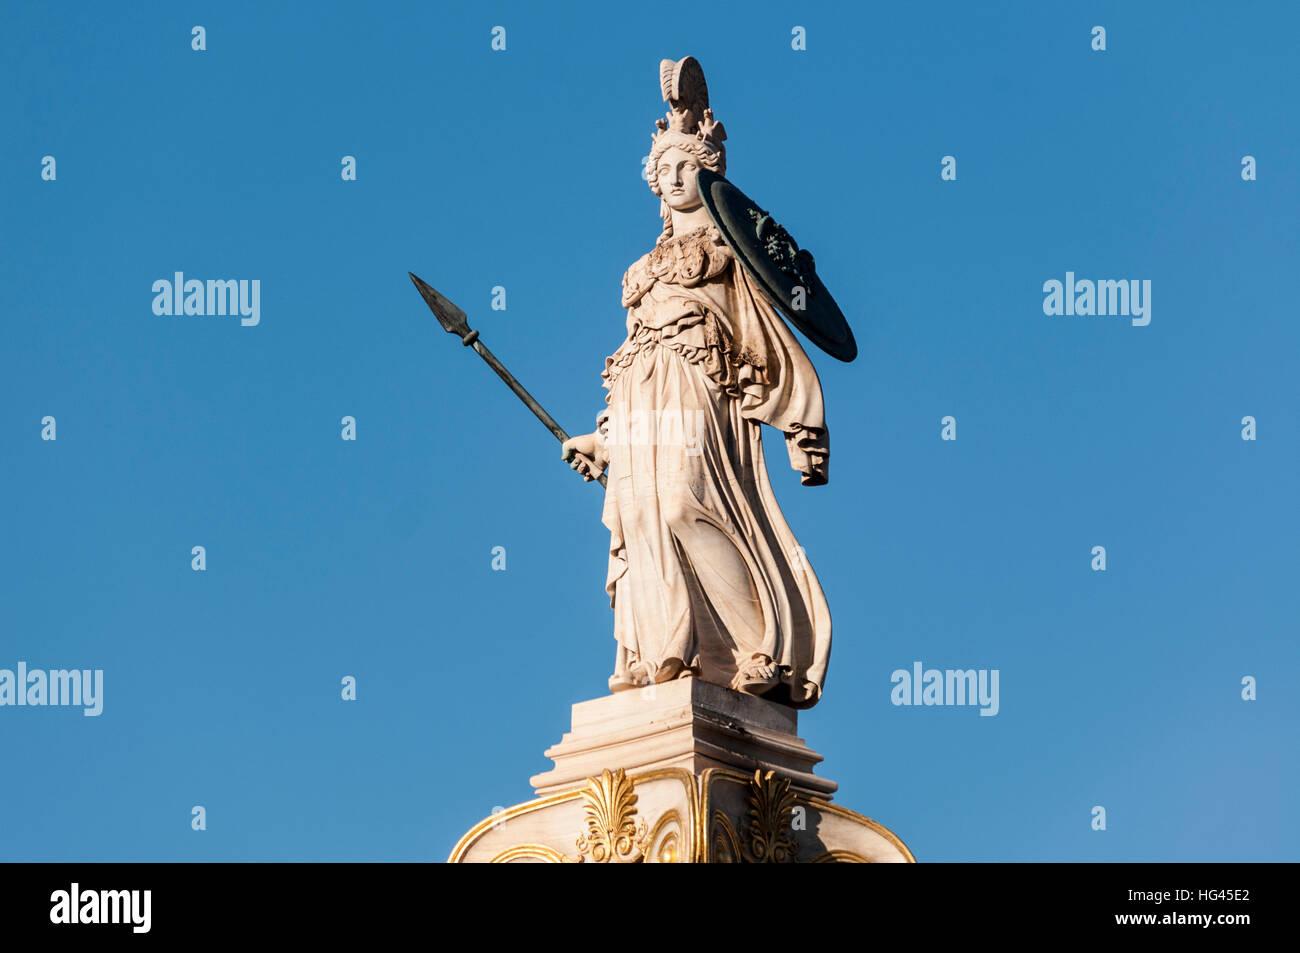 classic statue of athena - Stock Image